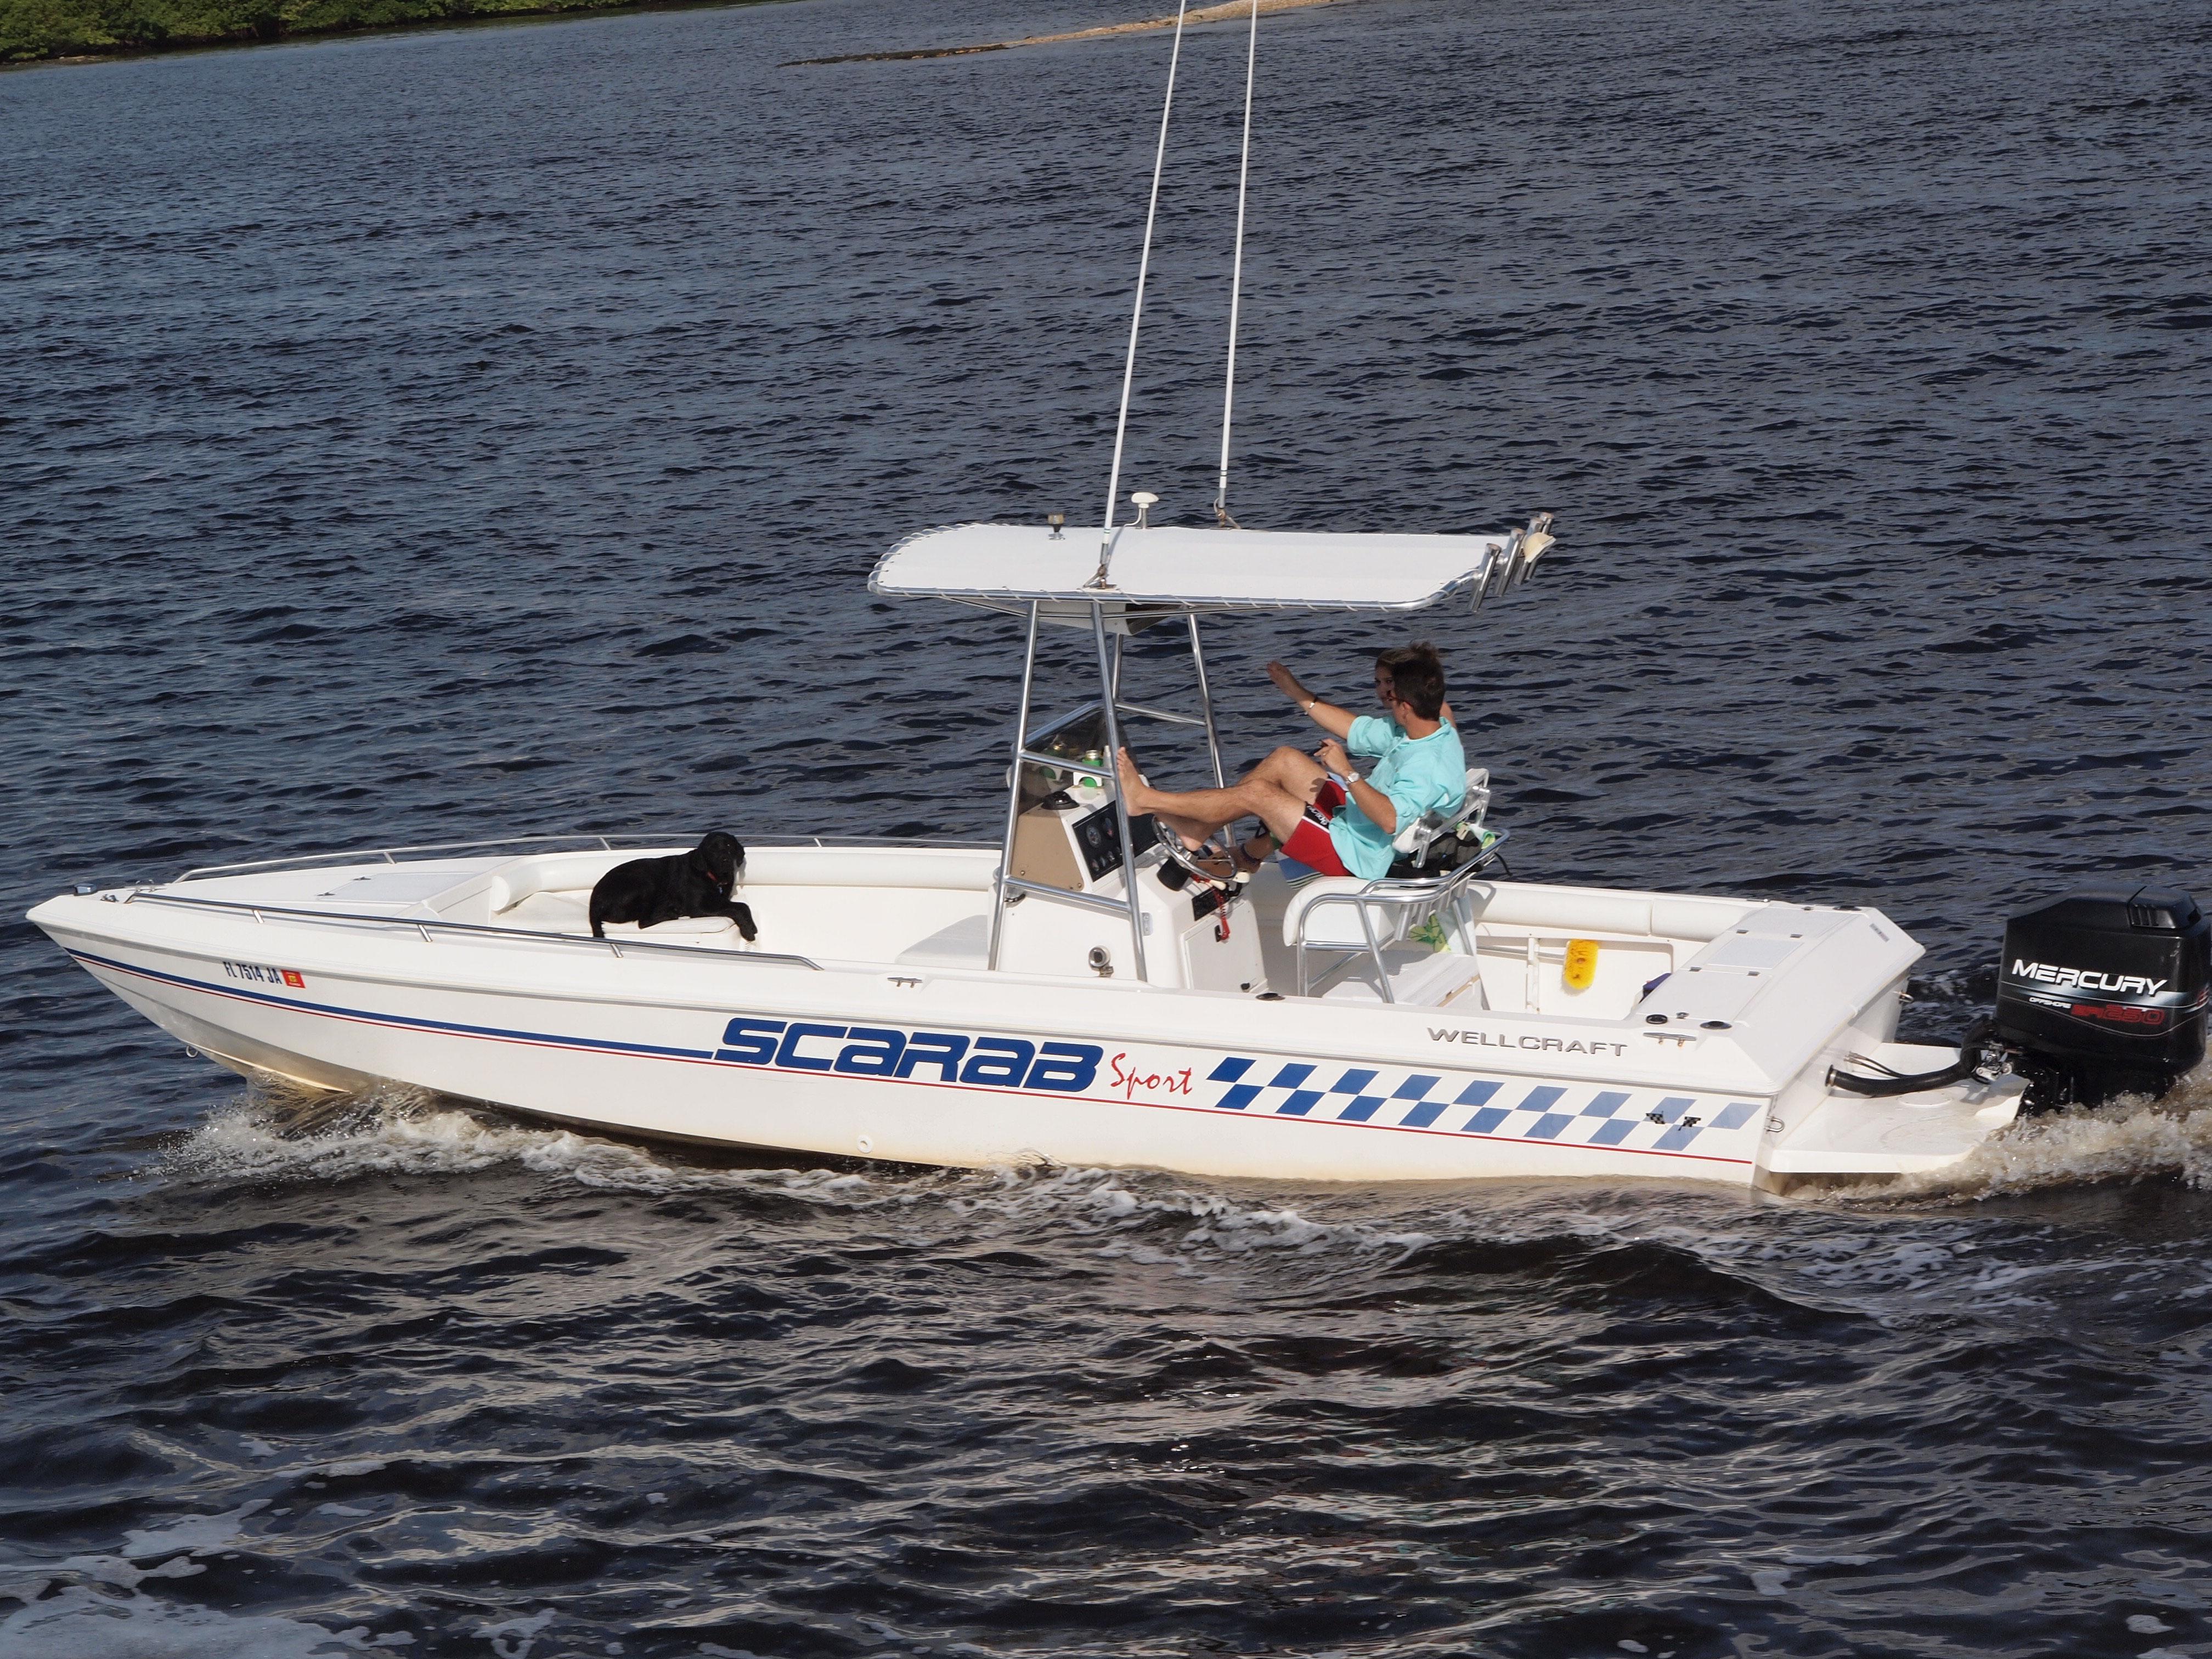 Scarab Boat Wikipedia